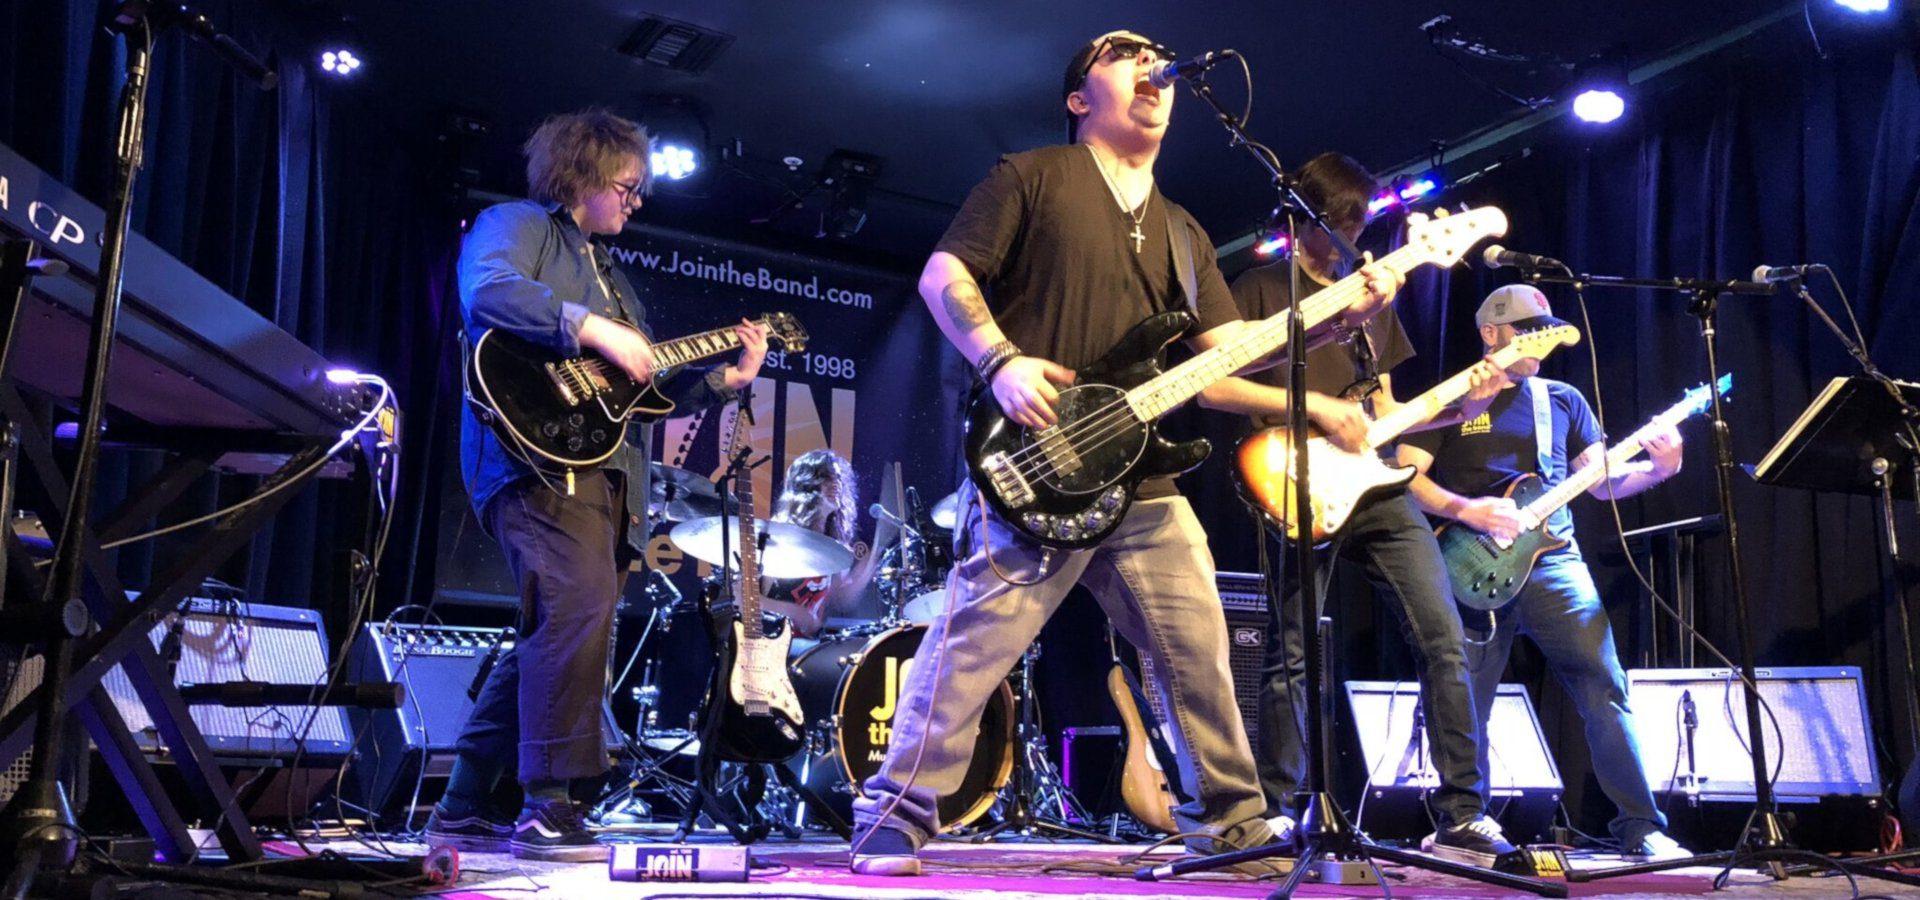 Teen Rock Band - Sherman Oaks, Los Angeles - Join The Band